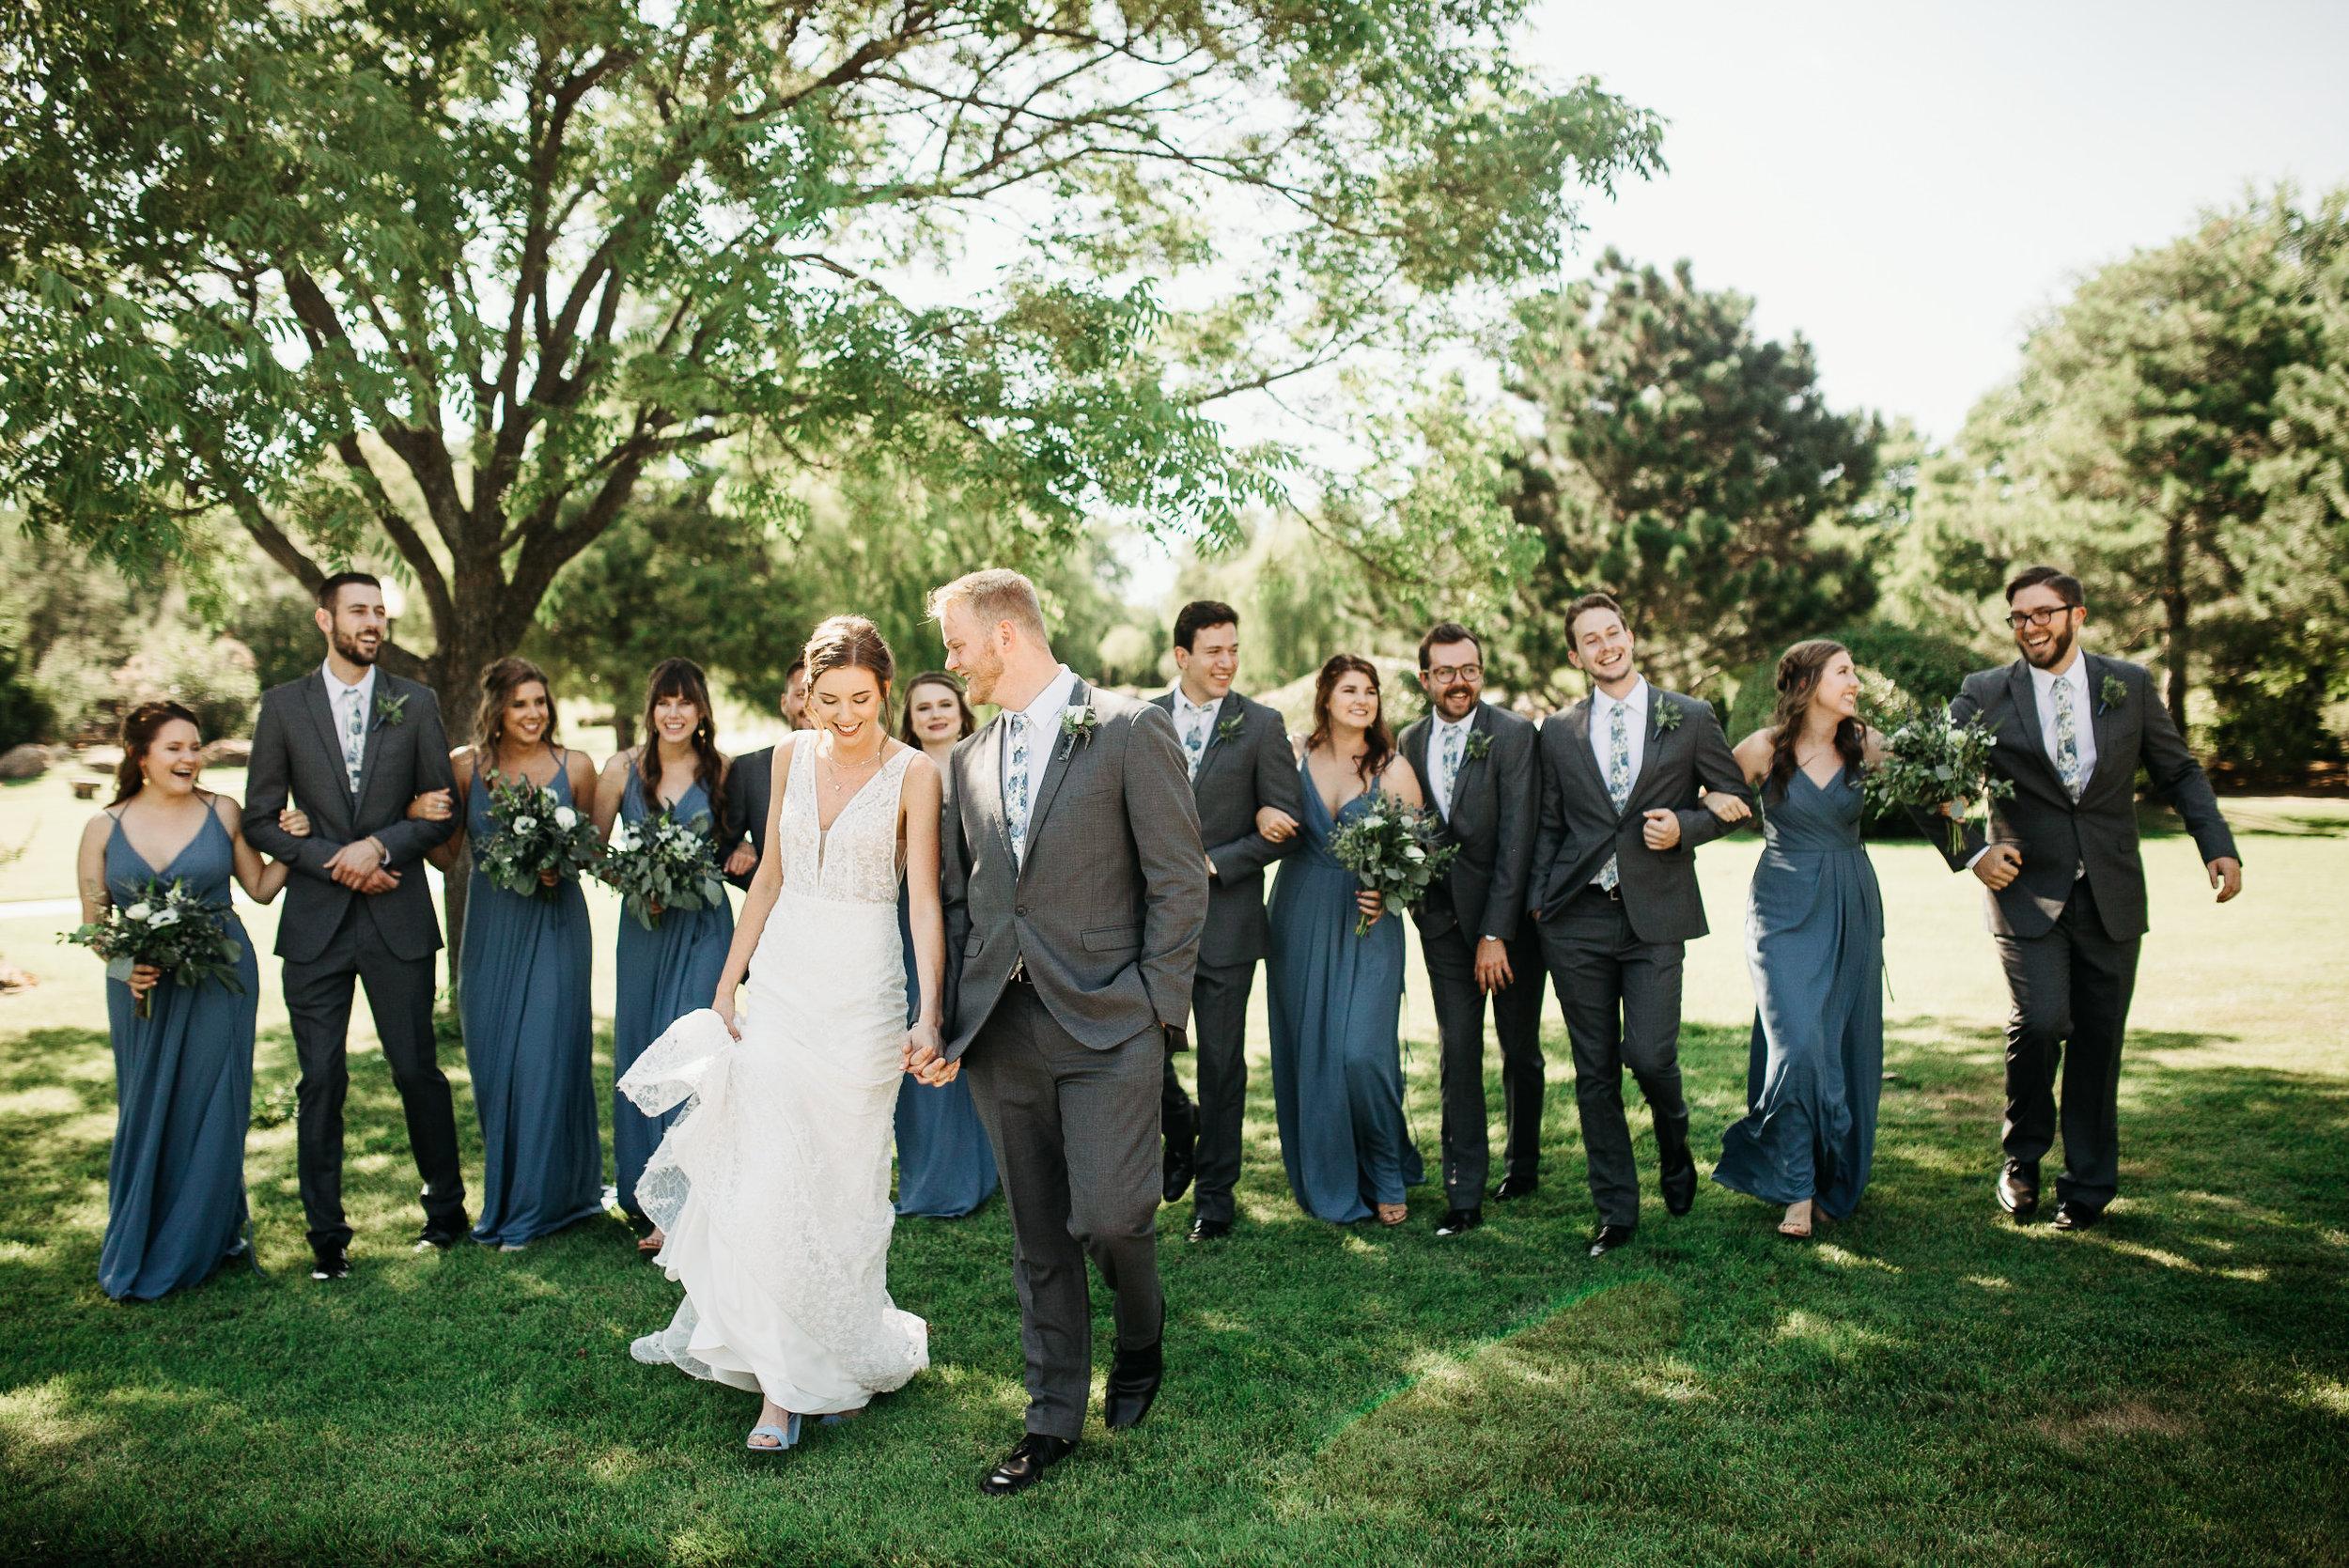 okc-wedding-photographer-coles-garden-wedding-okc-best-wedding-photographers-59.jpg